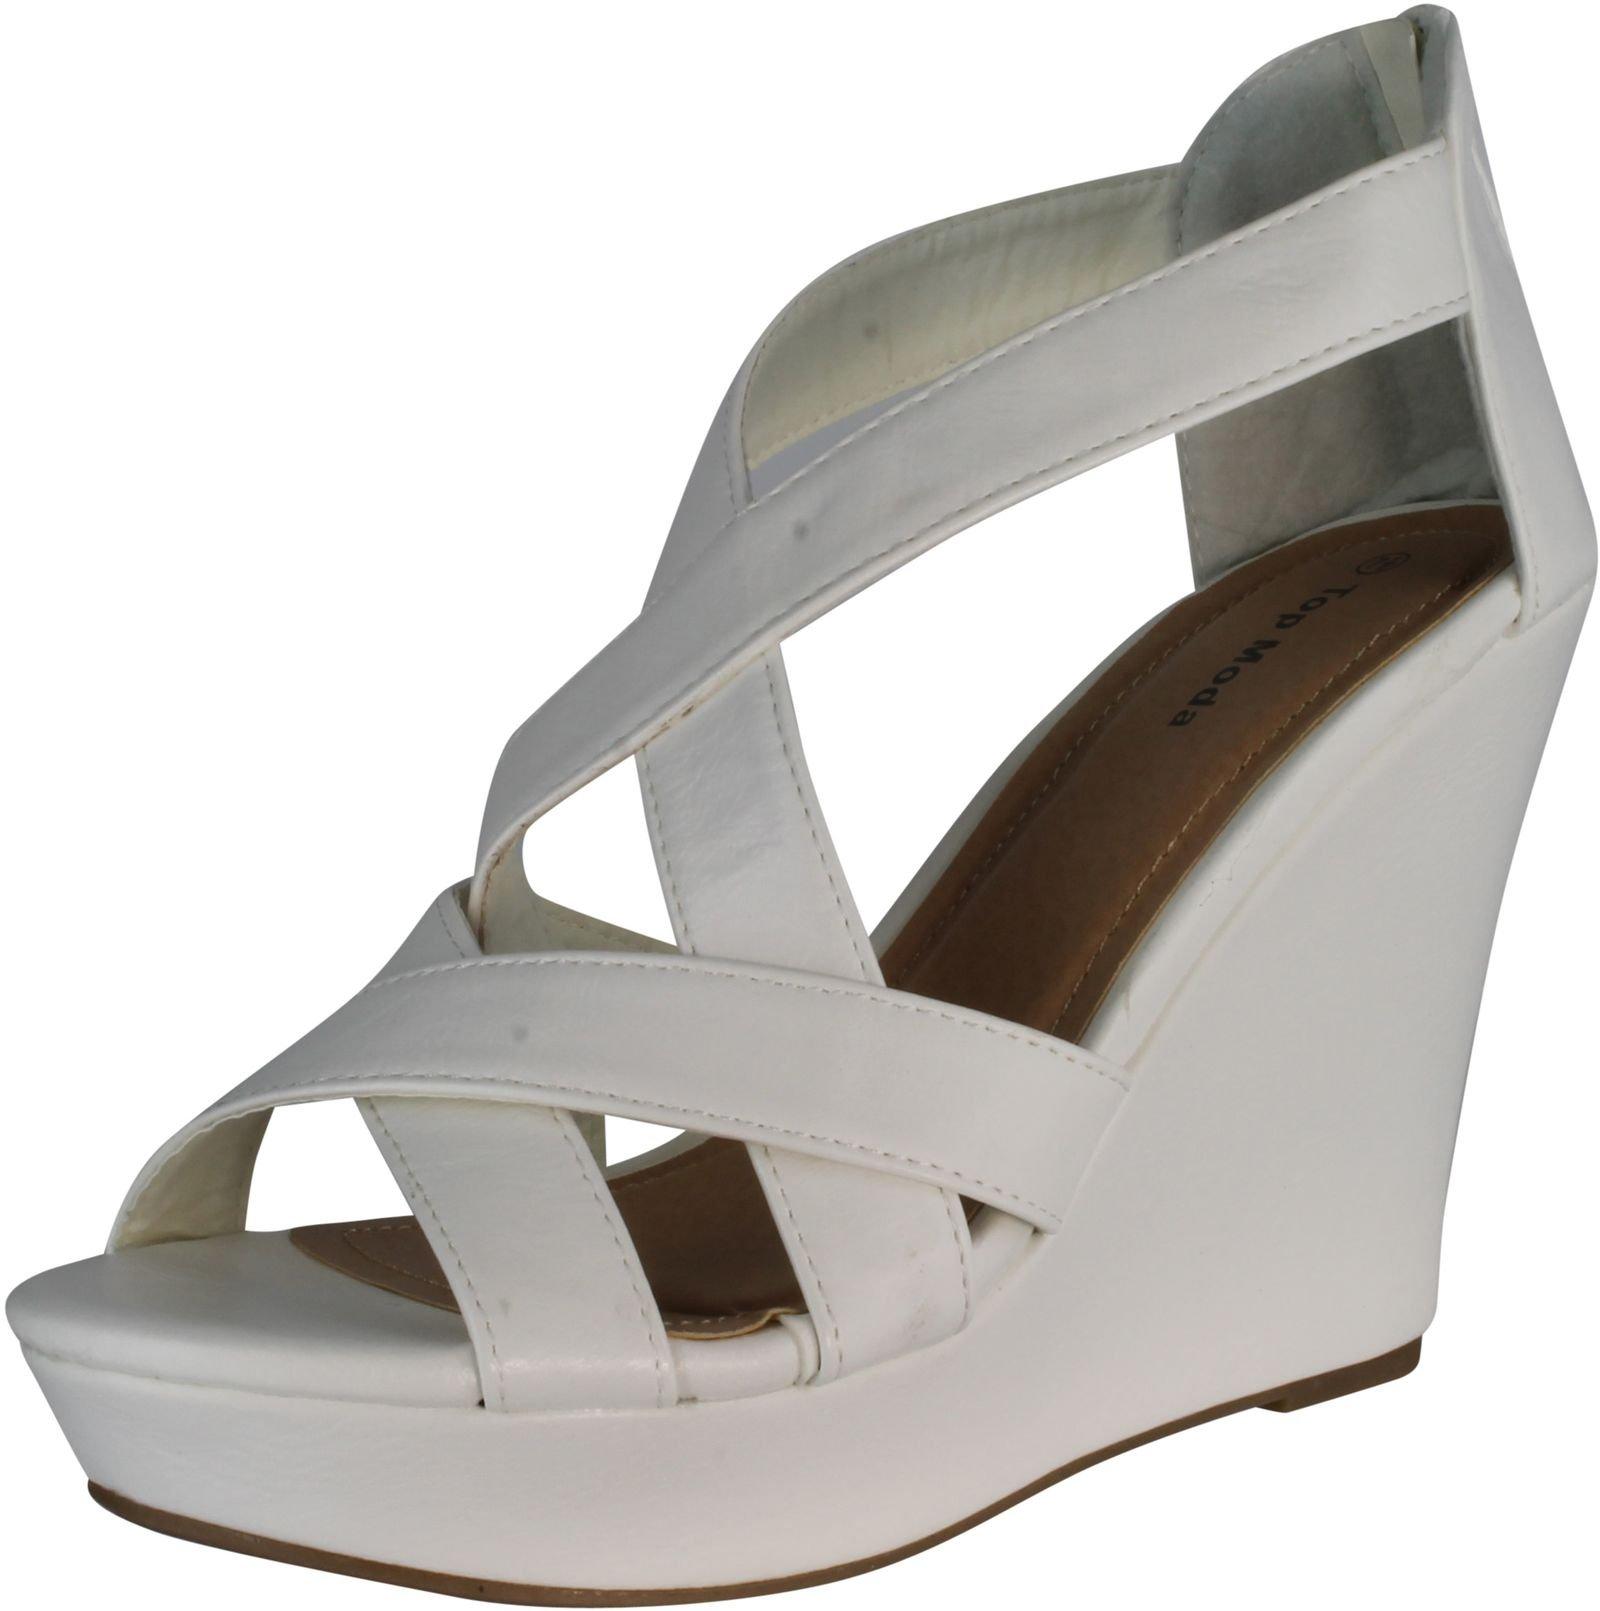 Top Moda Ella-18 Womens Gladiator Wedge Heel Sandals,White,8